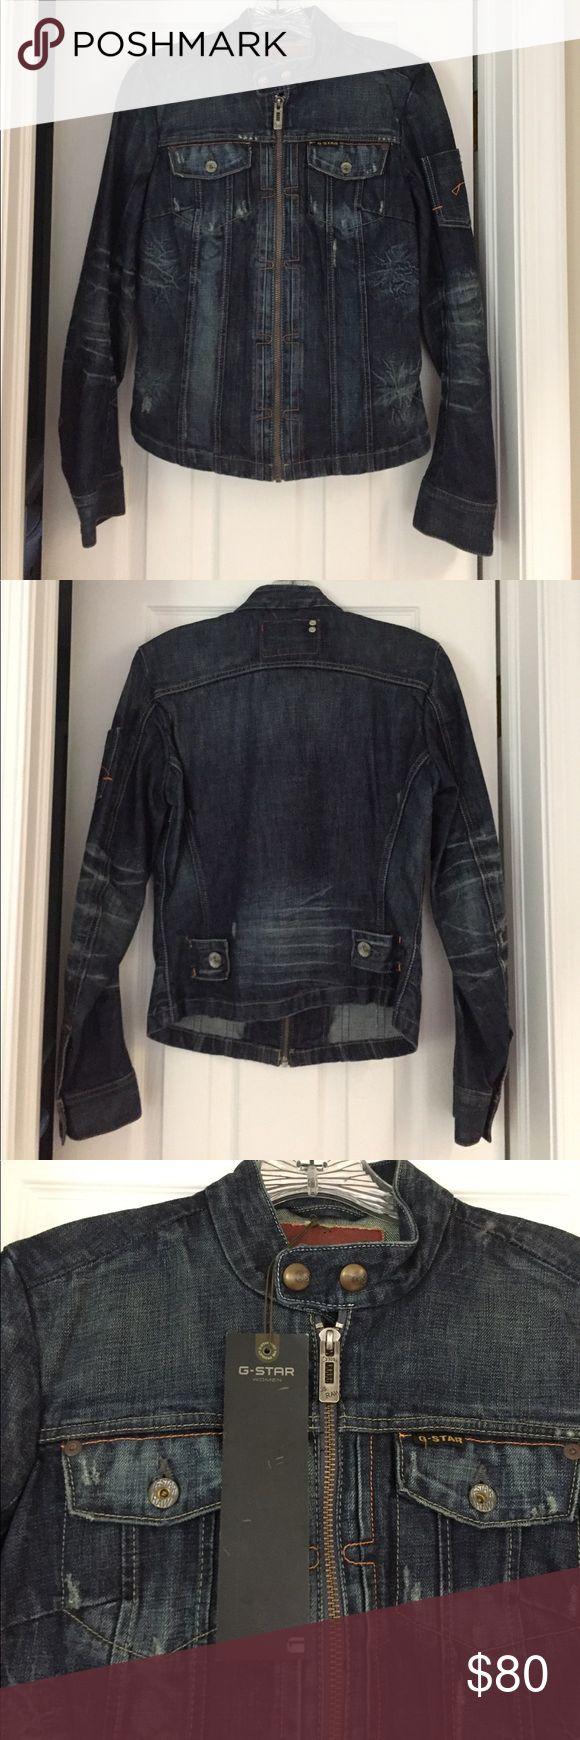 G Star Raw Jean jacket size medium new with tags G star raw jean jacket in size Medium. Brand new and never worn with tags. Great piece with great detailing! G-Star Jackets & Coats Jean Jackets